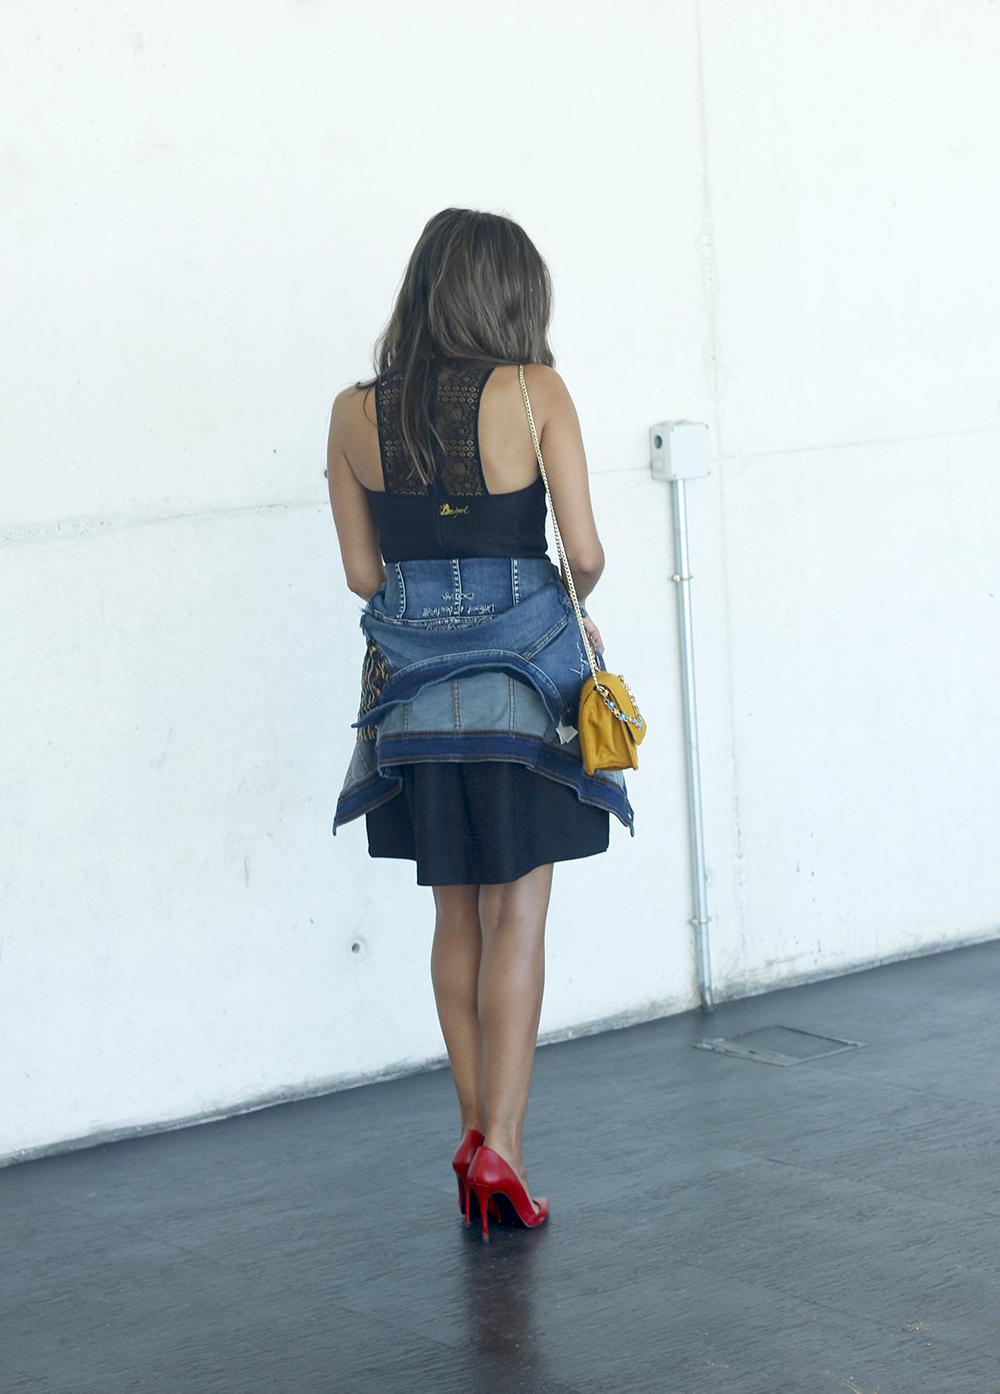 desigual black dress and denim jacket for fashion week madrid outfit fashion06